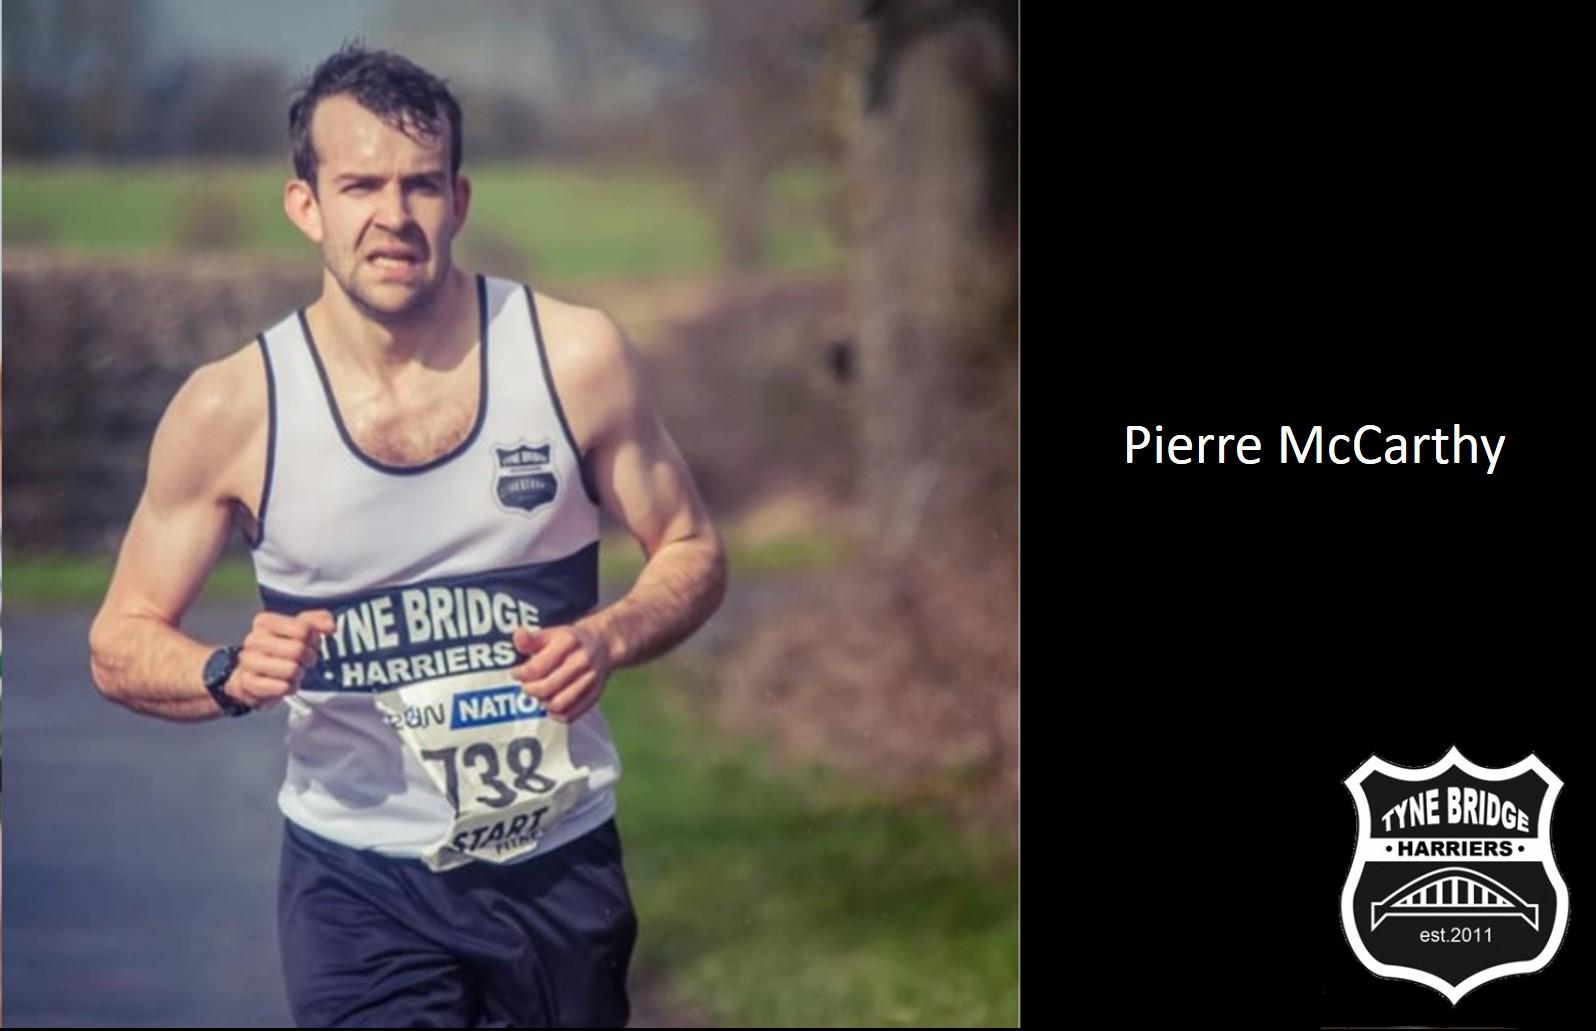 Pierre McCarthy